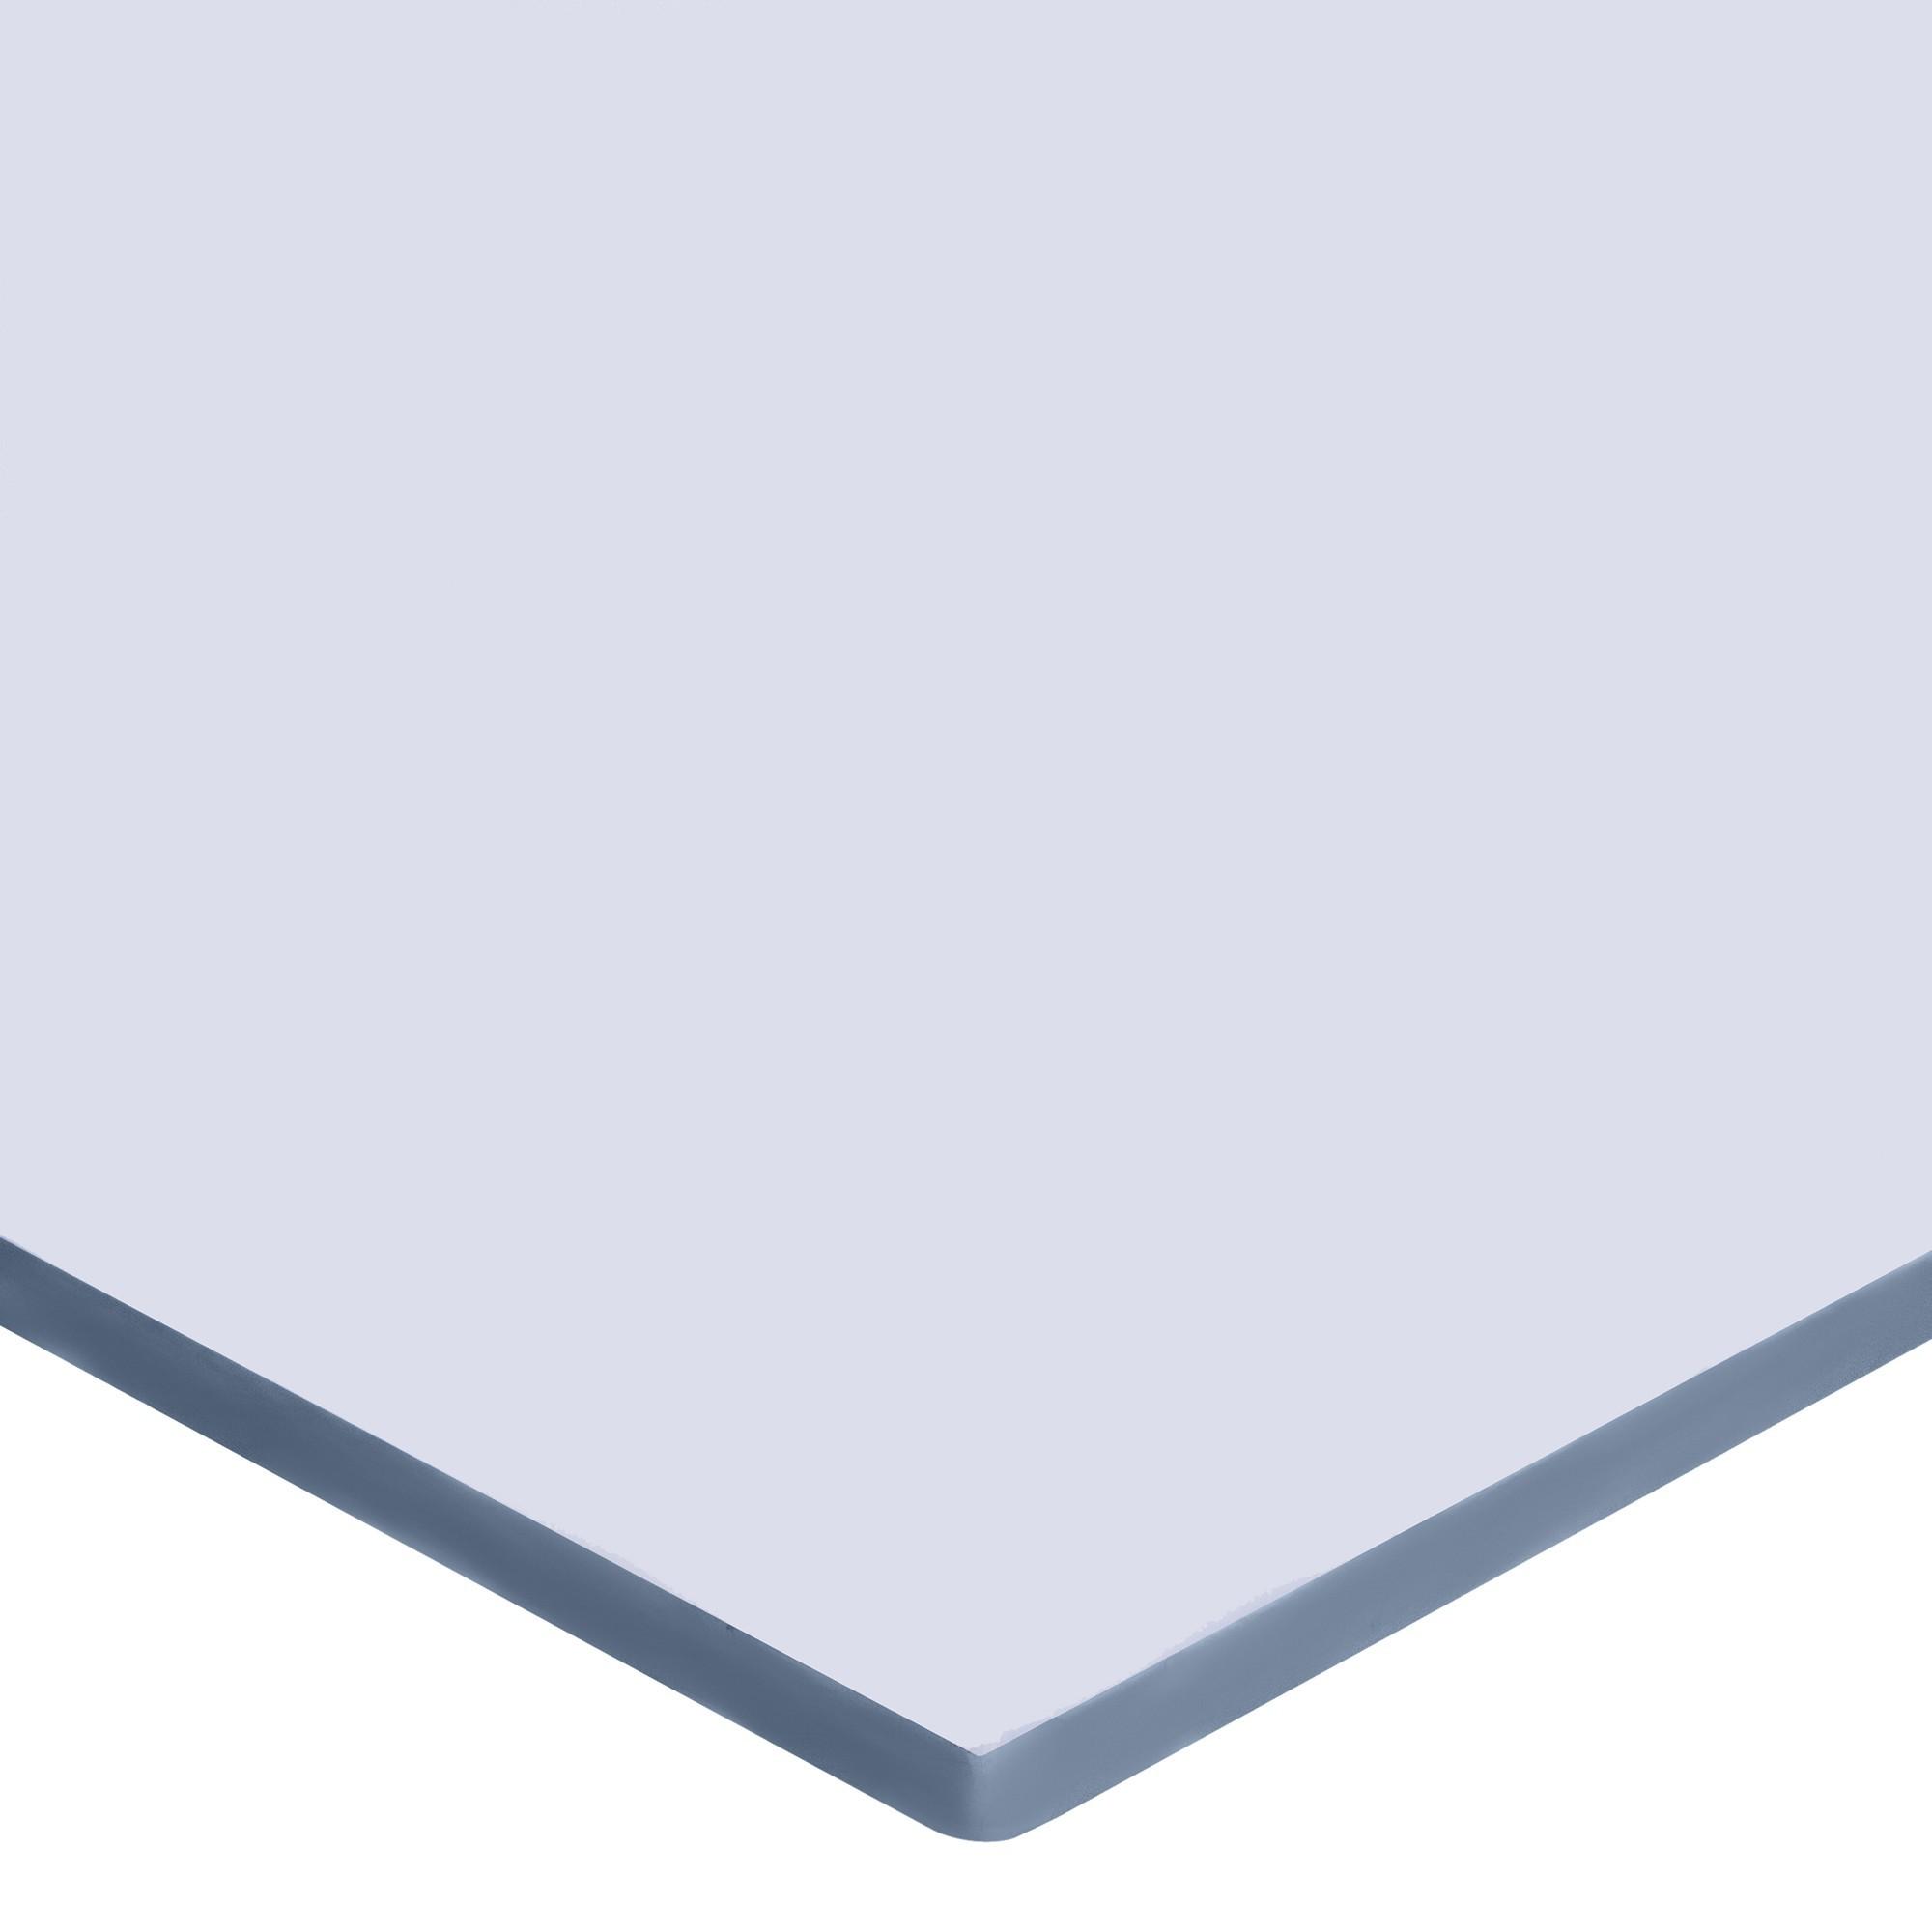 Стекло синтетическое 50х100х4 мм прозрачное